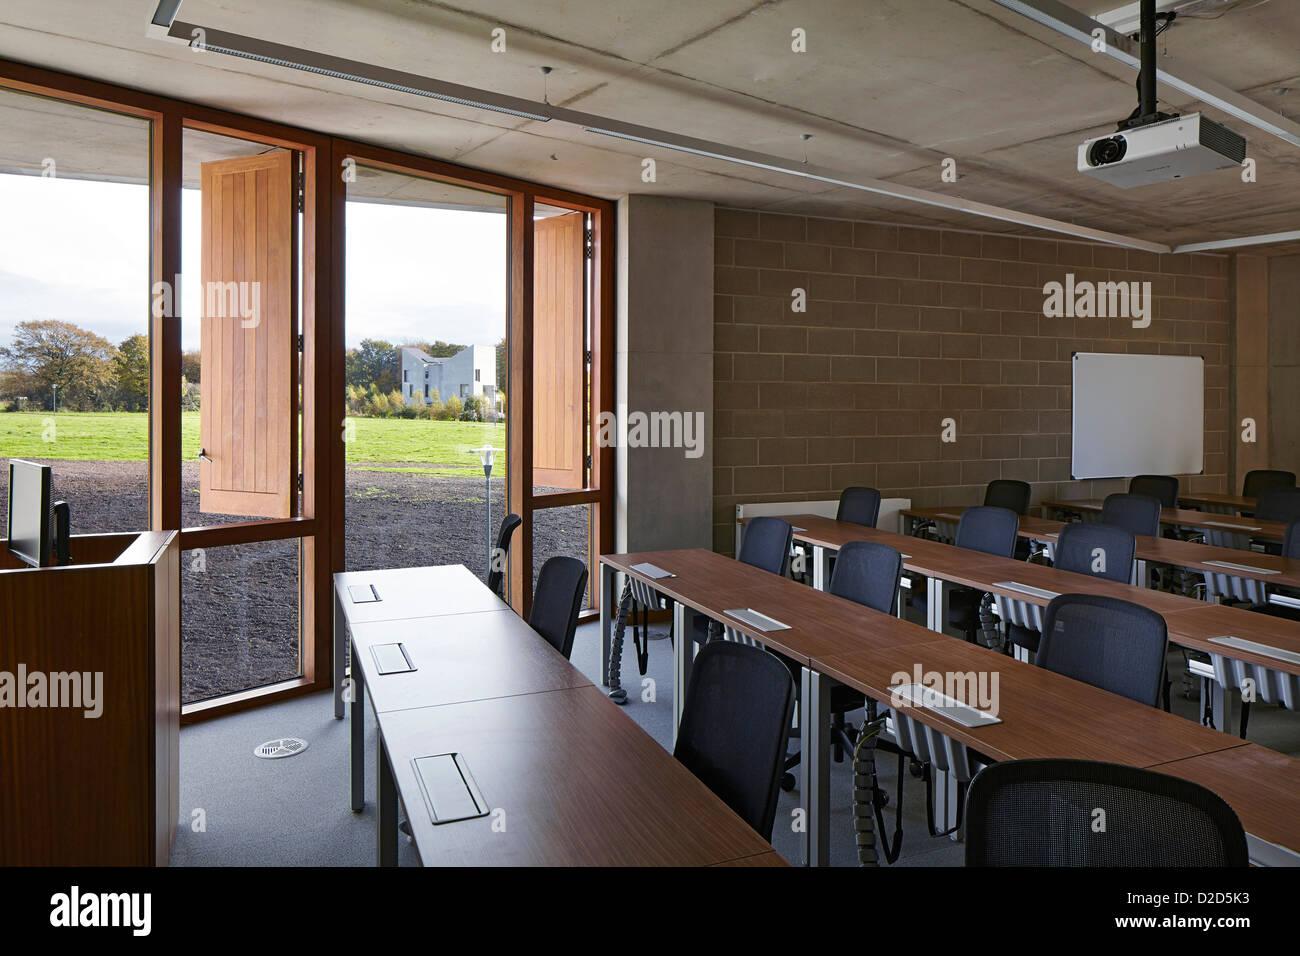 Medical School Building And Student Accommodation University Limerick Ireland Architect Grafton Architects 2012 S